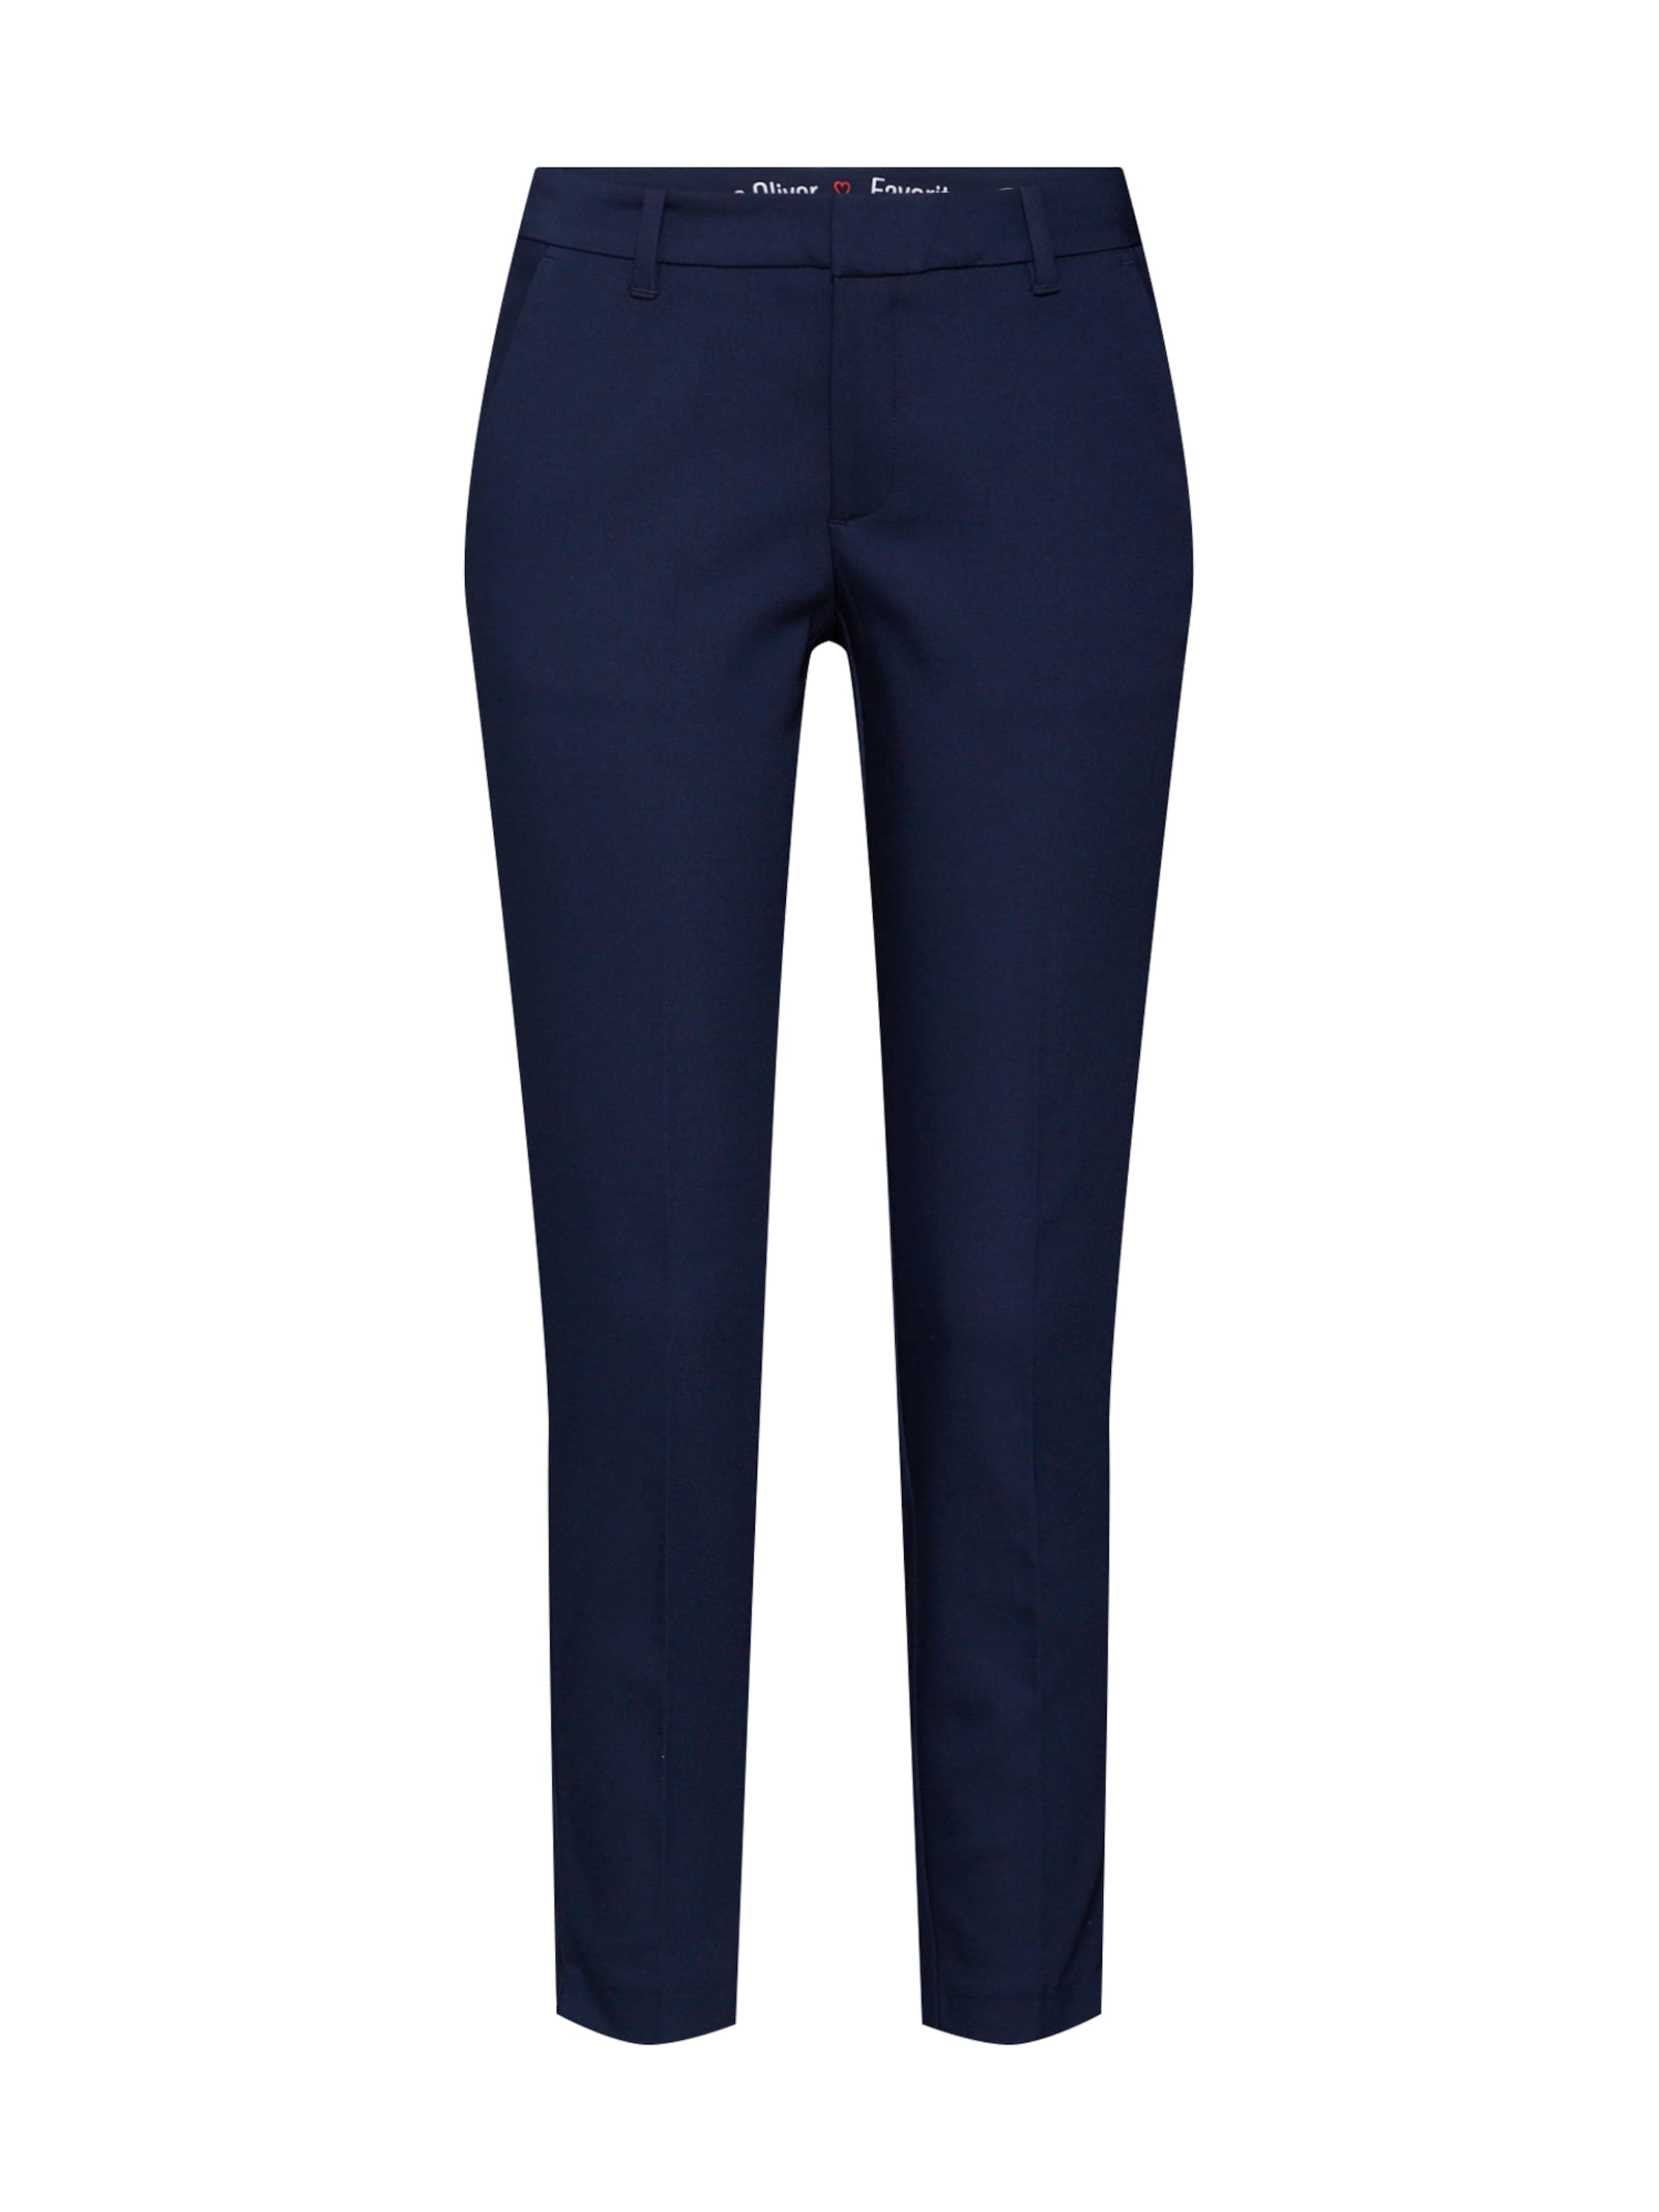 S Label Pantalon oliver Plis À Marine Bleu Red En TKclJF1